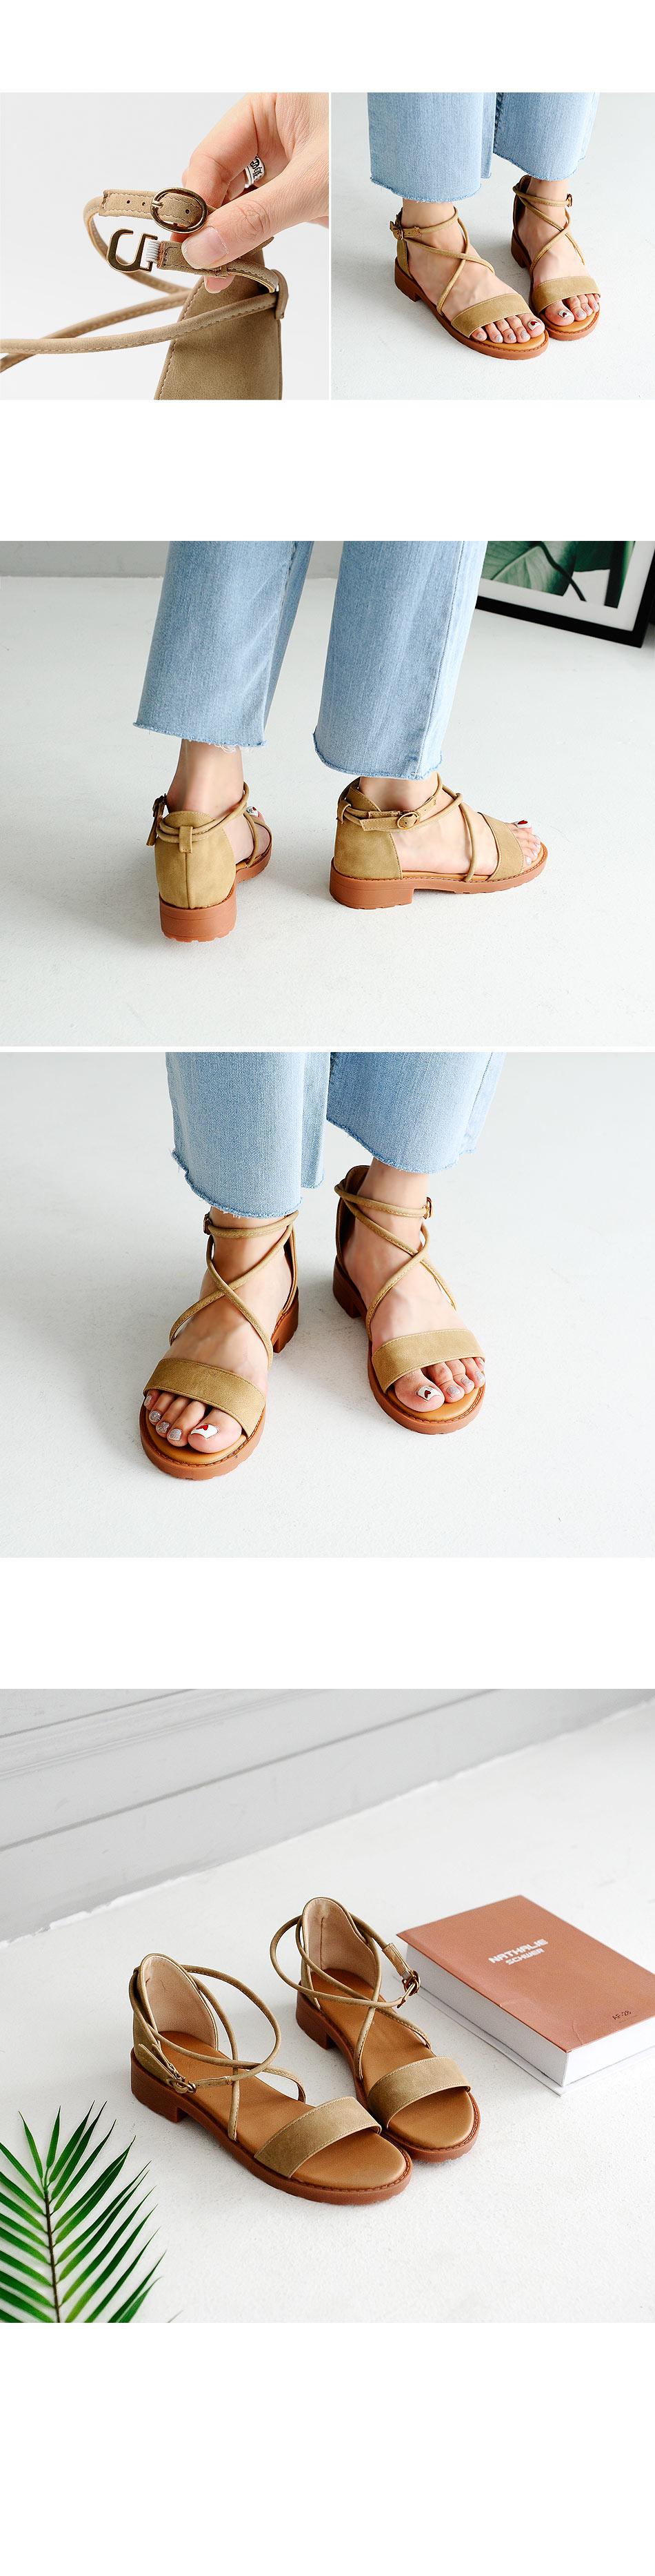 Robinin strap sandals 3cm